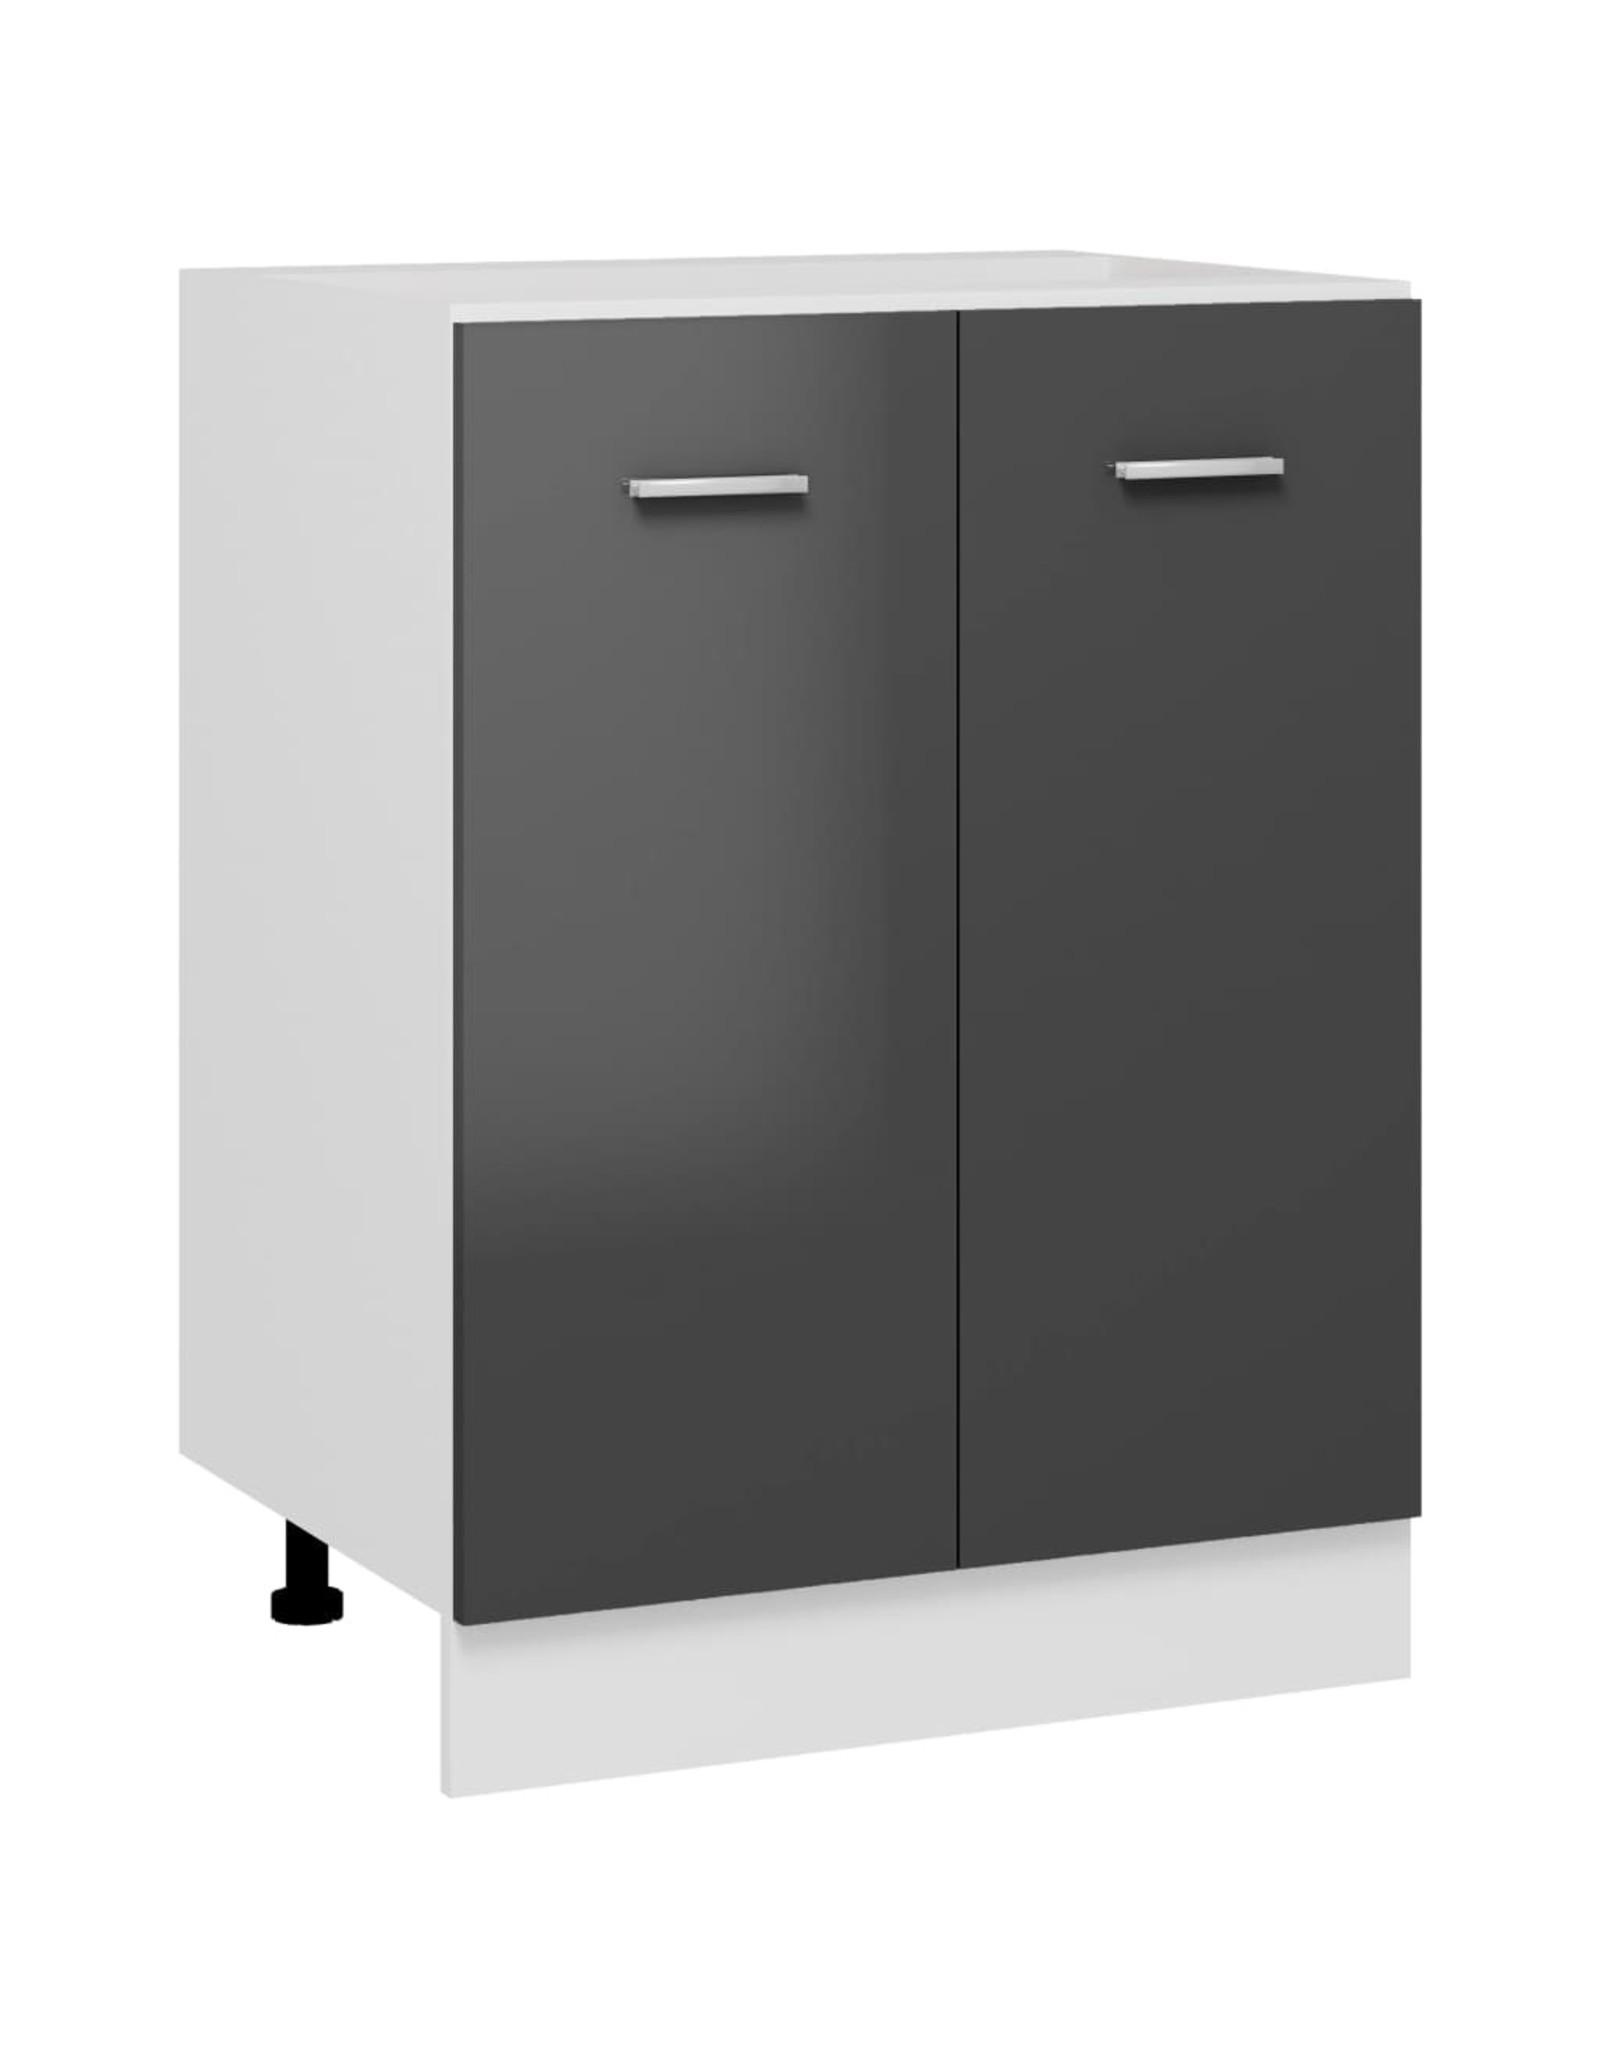 Onderkast 60x46x81,5 cm spaanplaat hoogglans grijs